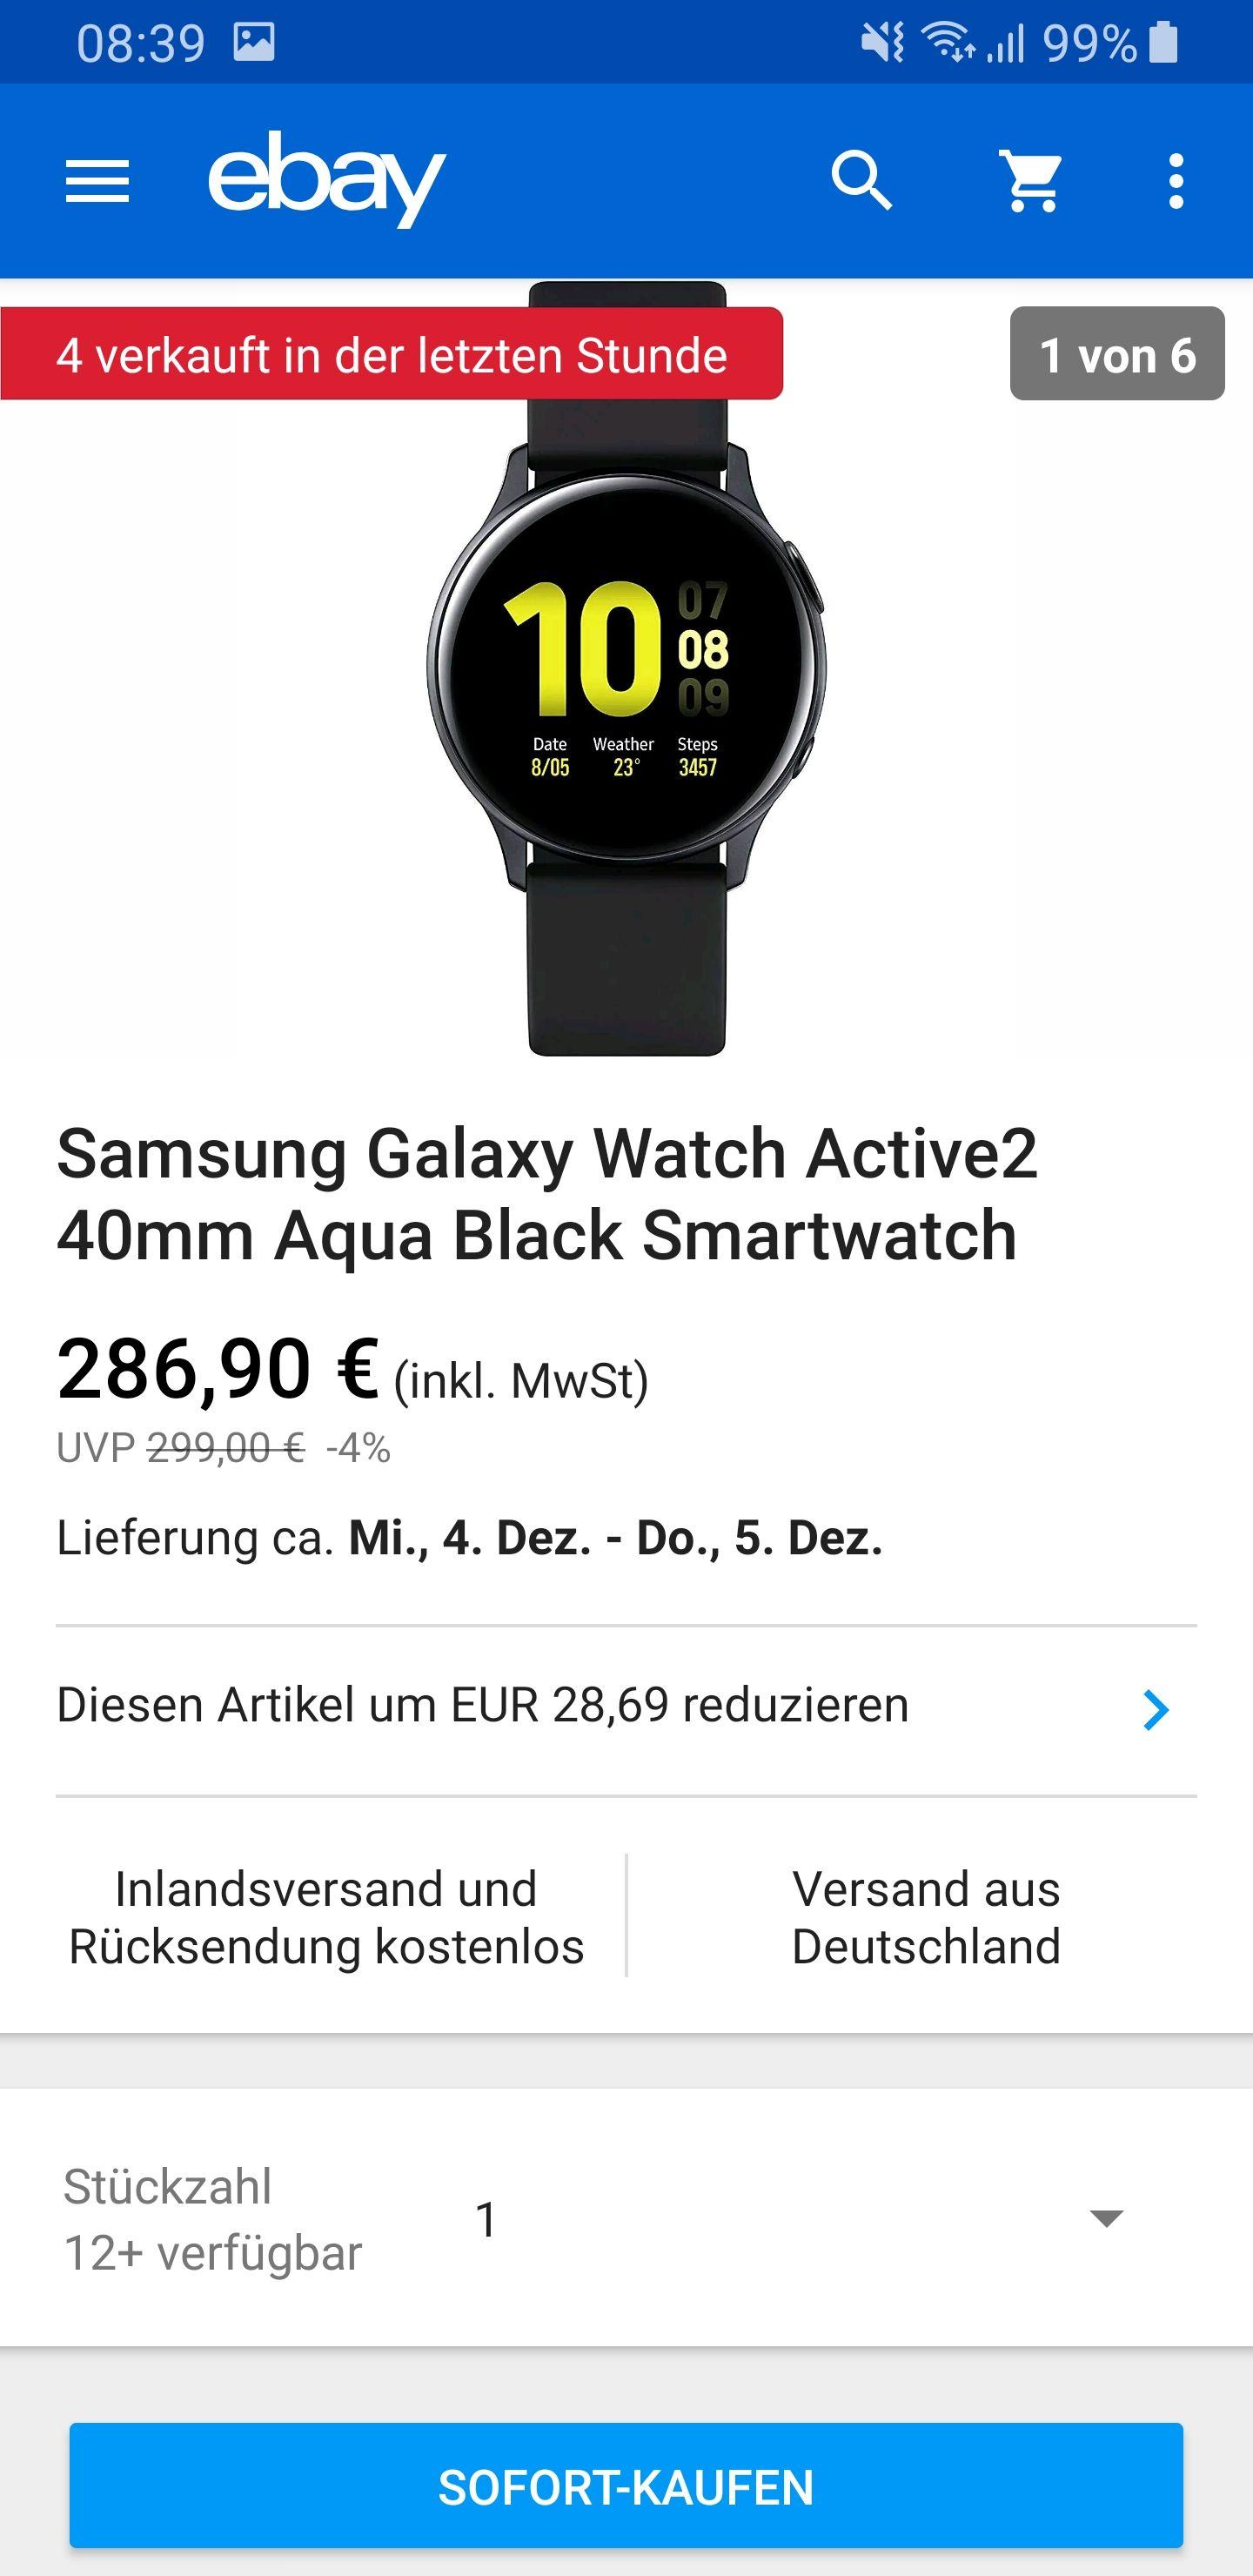 Samsung Galaxy Watch Active 2, 40mm, aqua Black Smartwatch